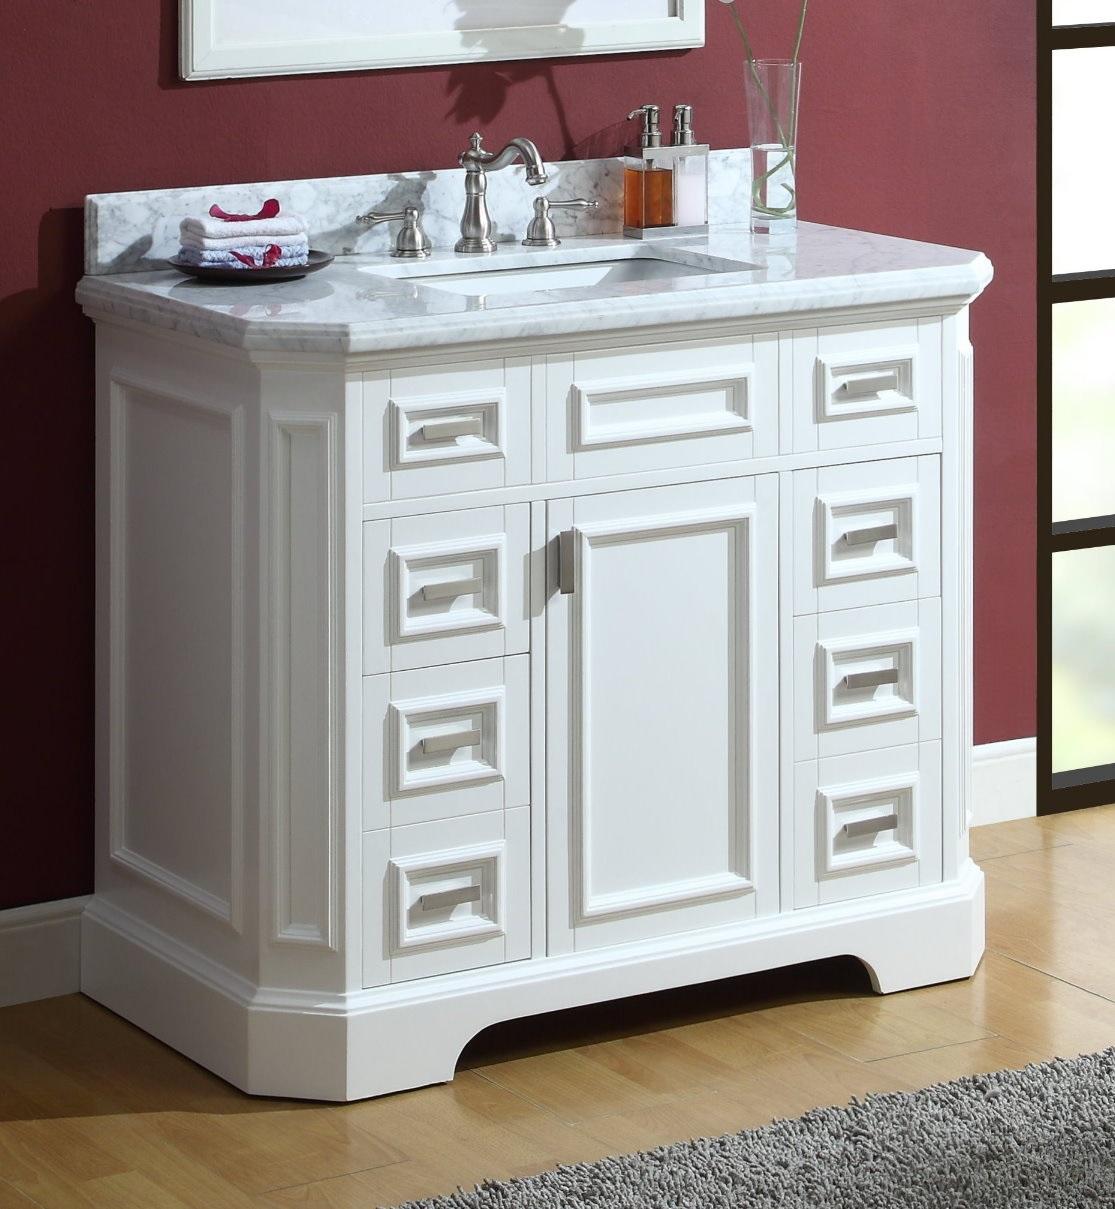 "Adelina 42"" Carrara Marble White Bathroom Sink Vanity"